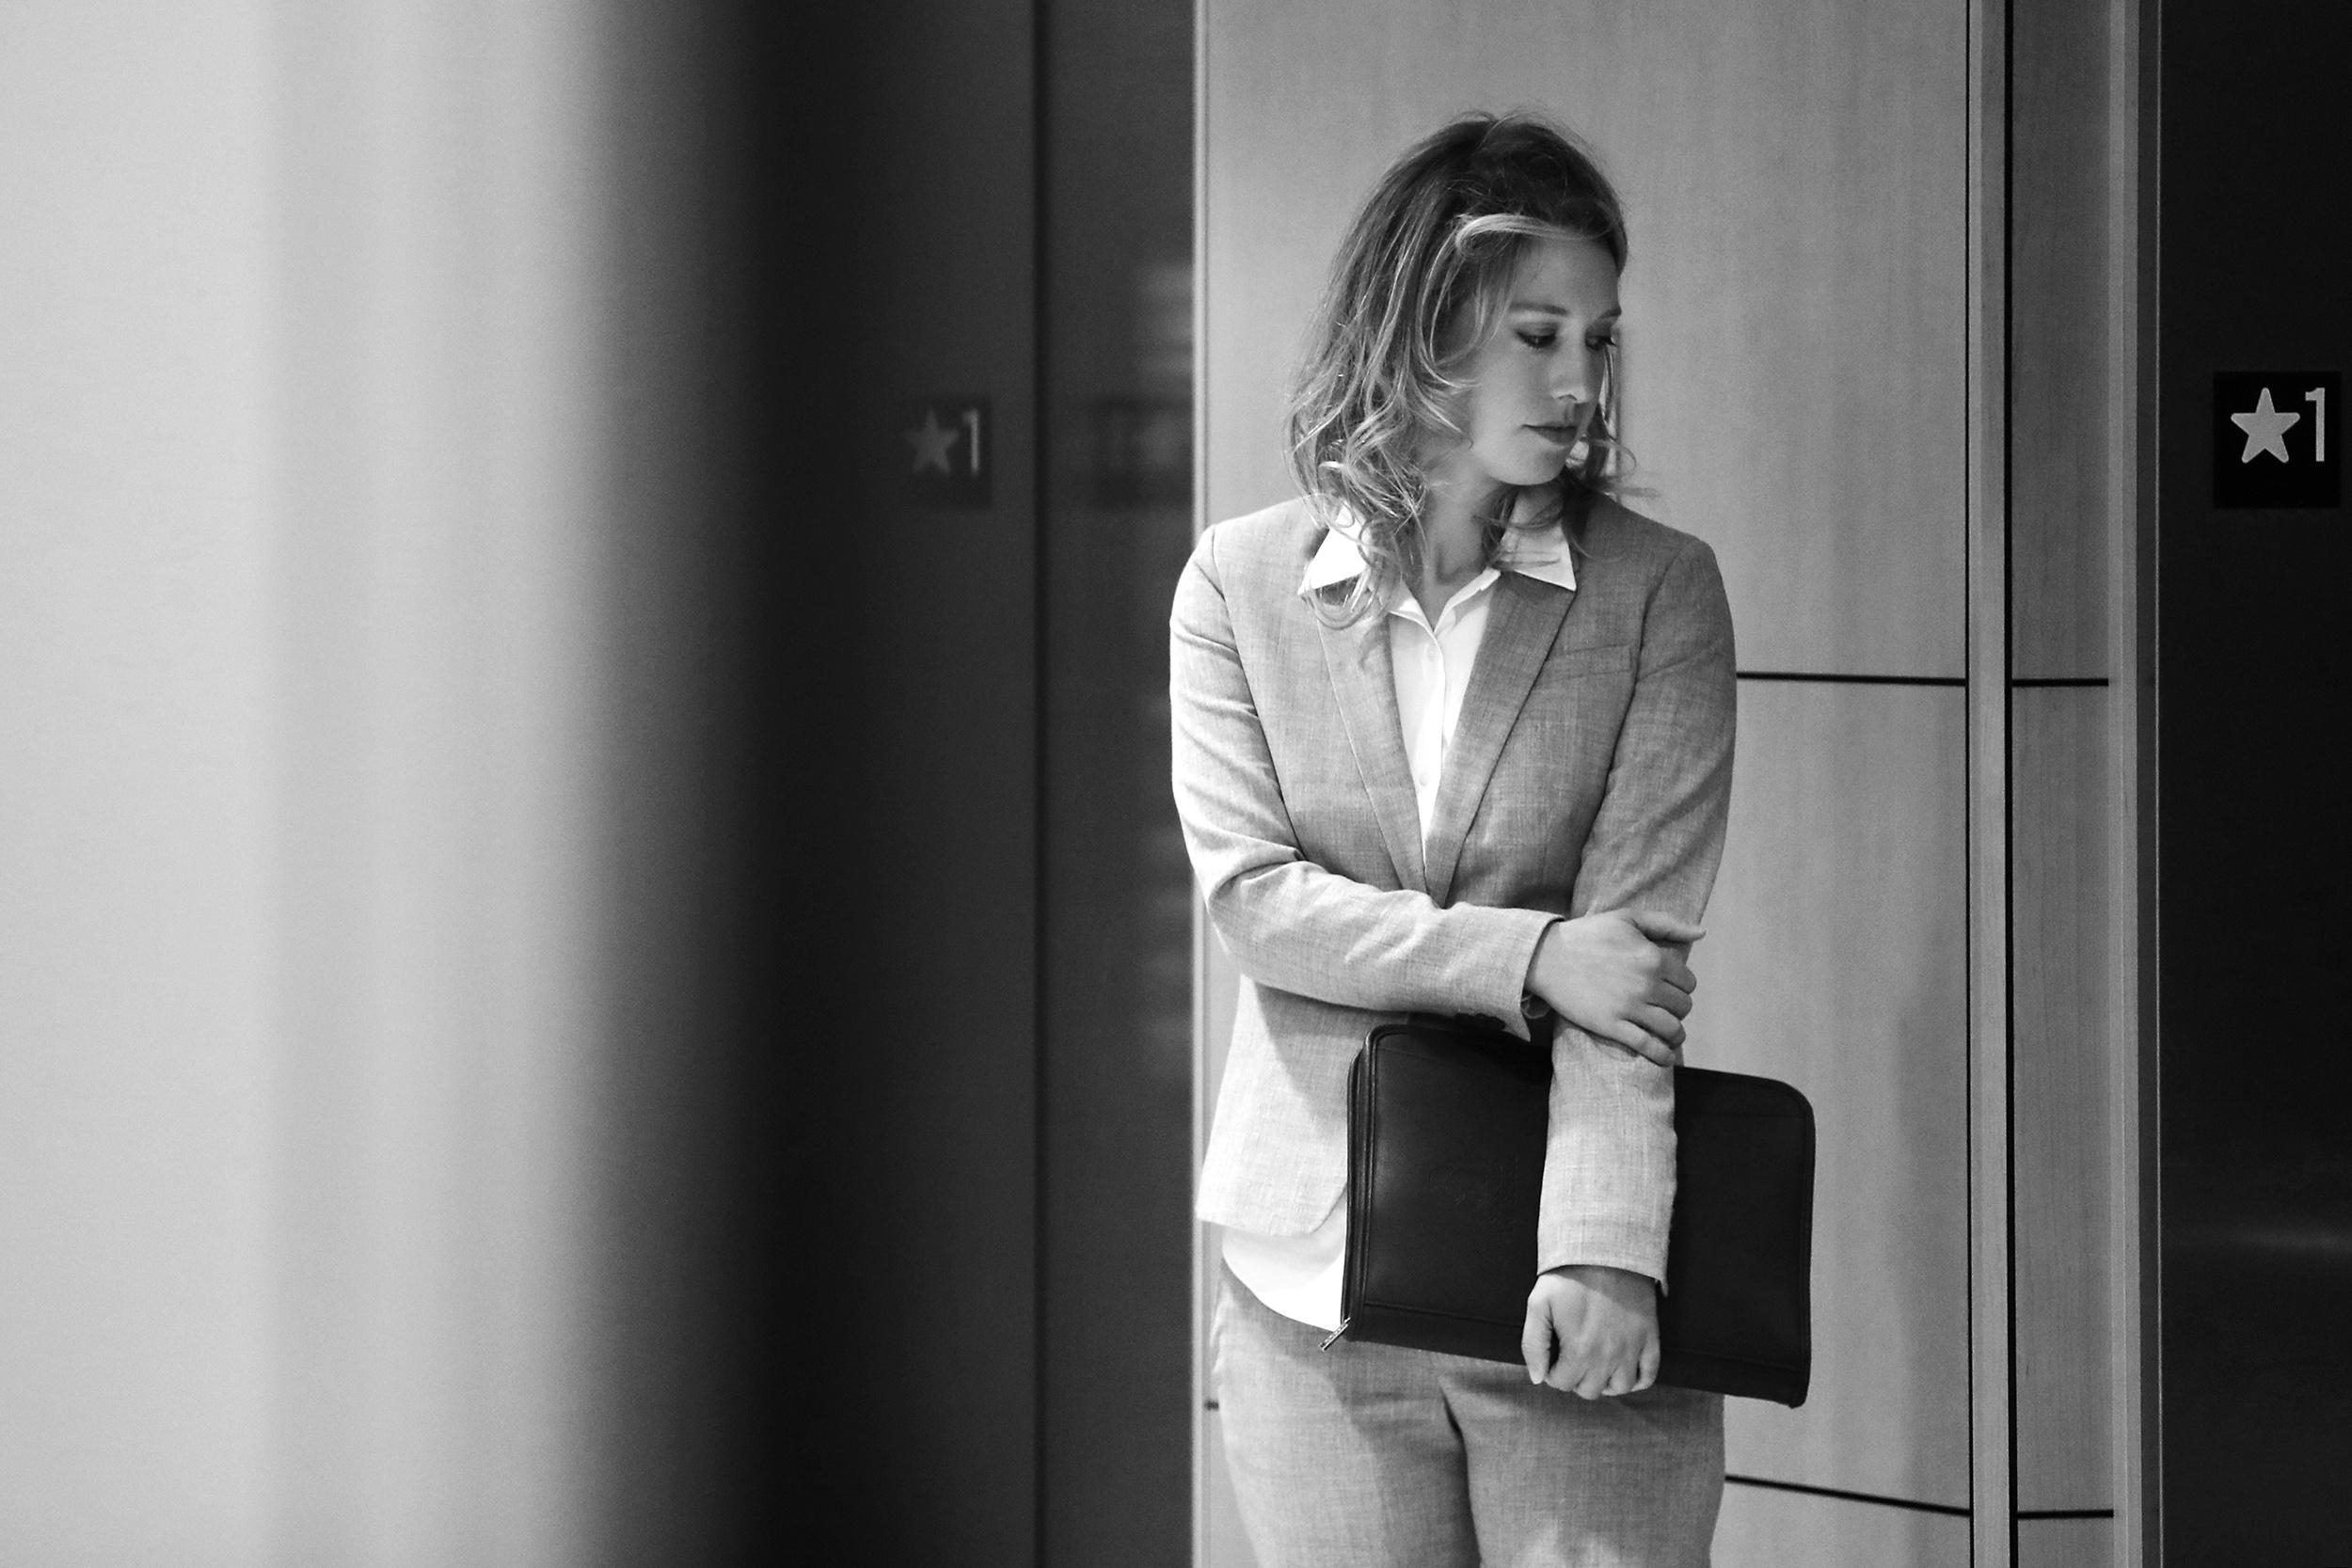 Will Theranos founder Elizabeth Holmes' unusual defense strategy work?